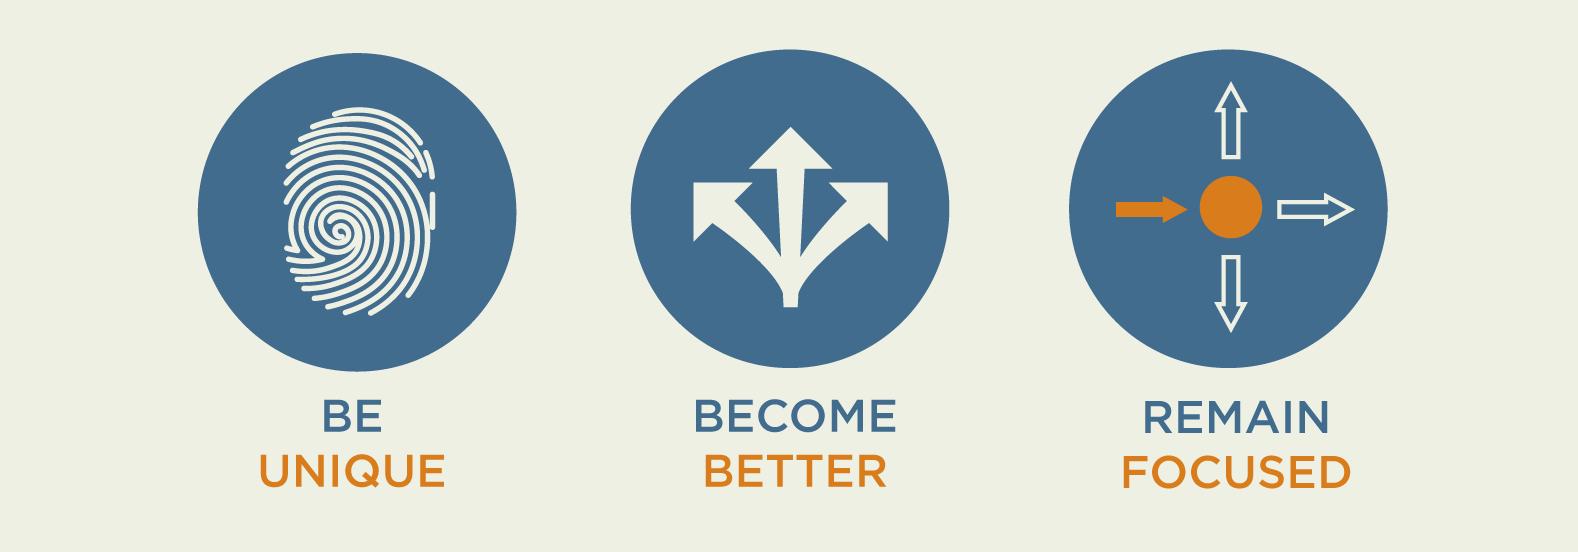 3_Keys_to_Strategicplan.png